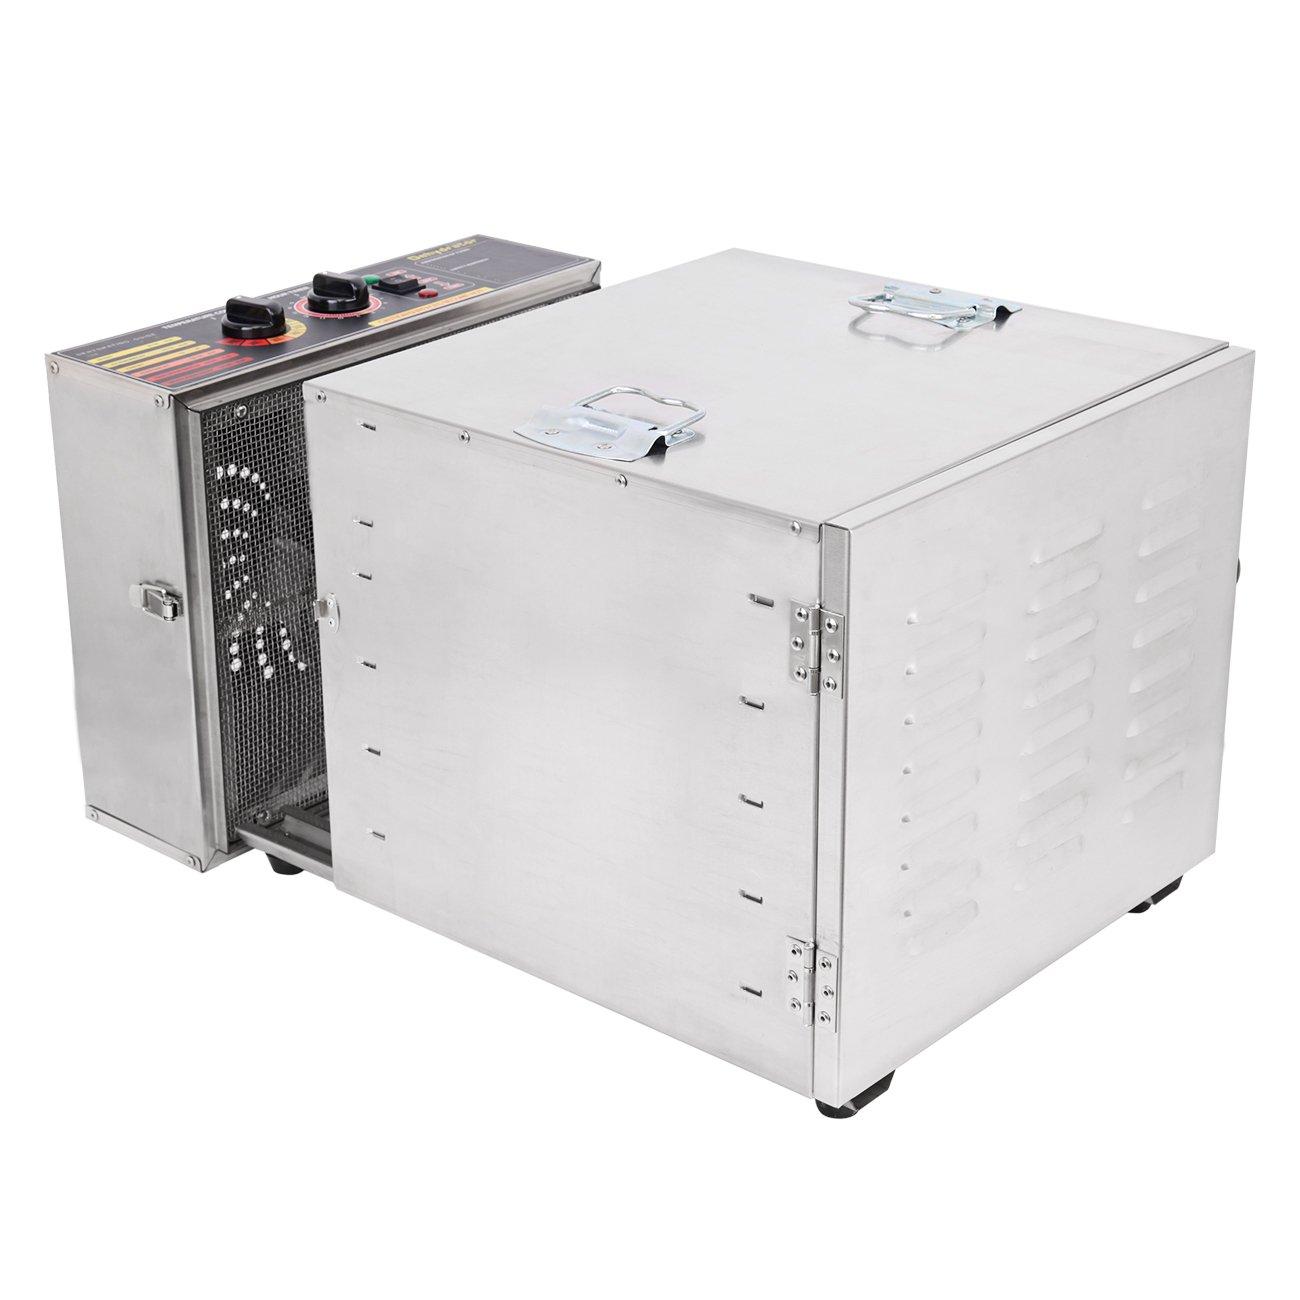 Ridgeyard 1000W Dehydrator Commercial Grade Stainless Steel Digital Food Dehydrator Jerky Dryer 10 Trays 158 Degree Fahrenheit with 15 Hour Timer by Ridgeyard (Image #5)